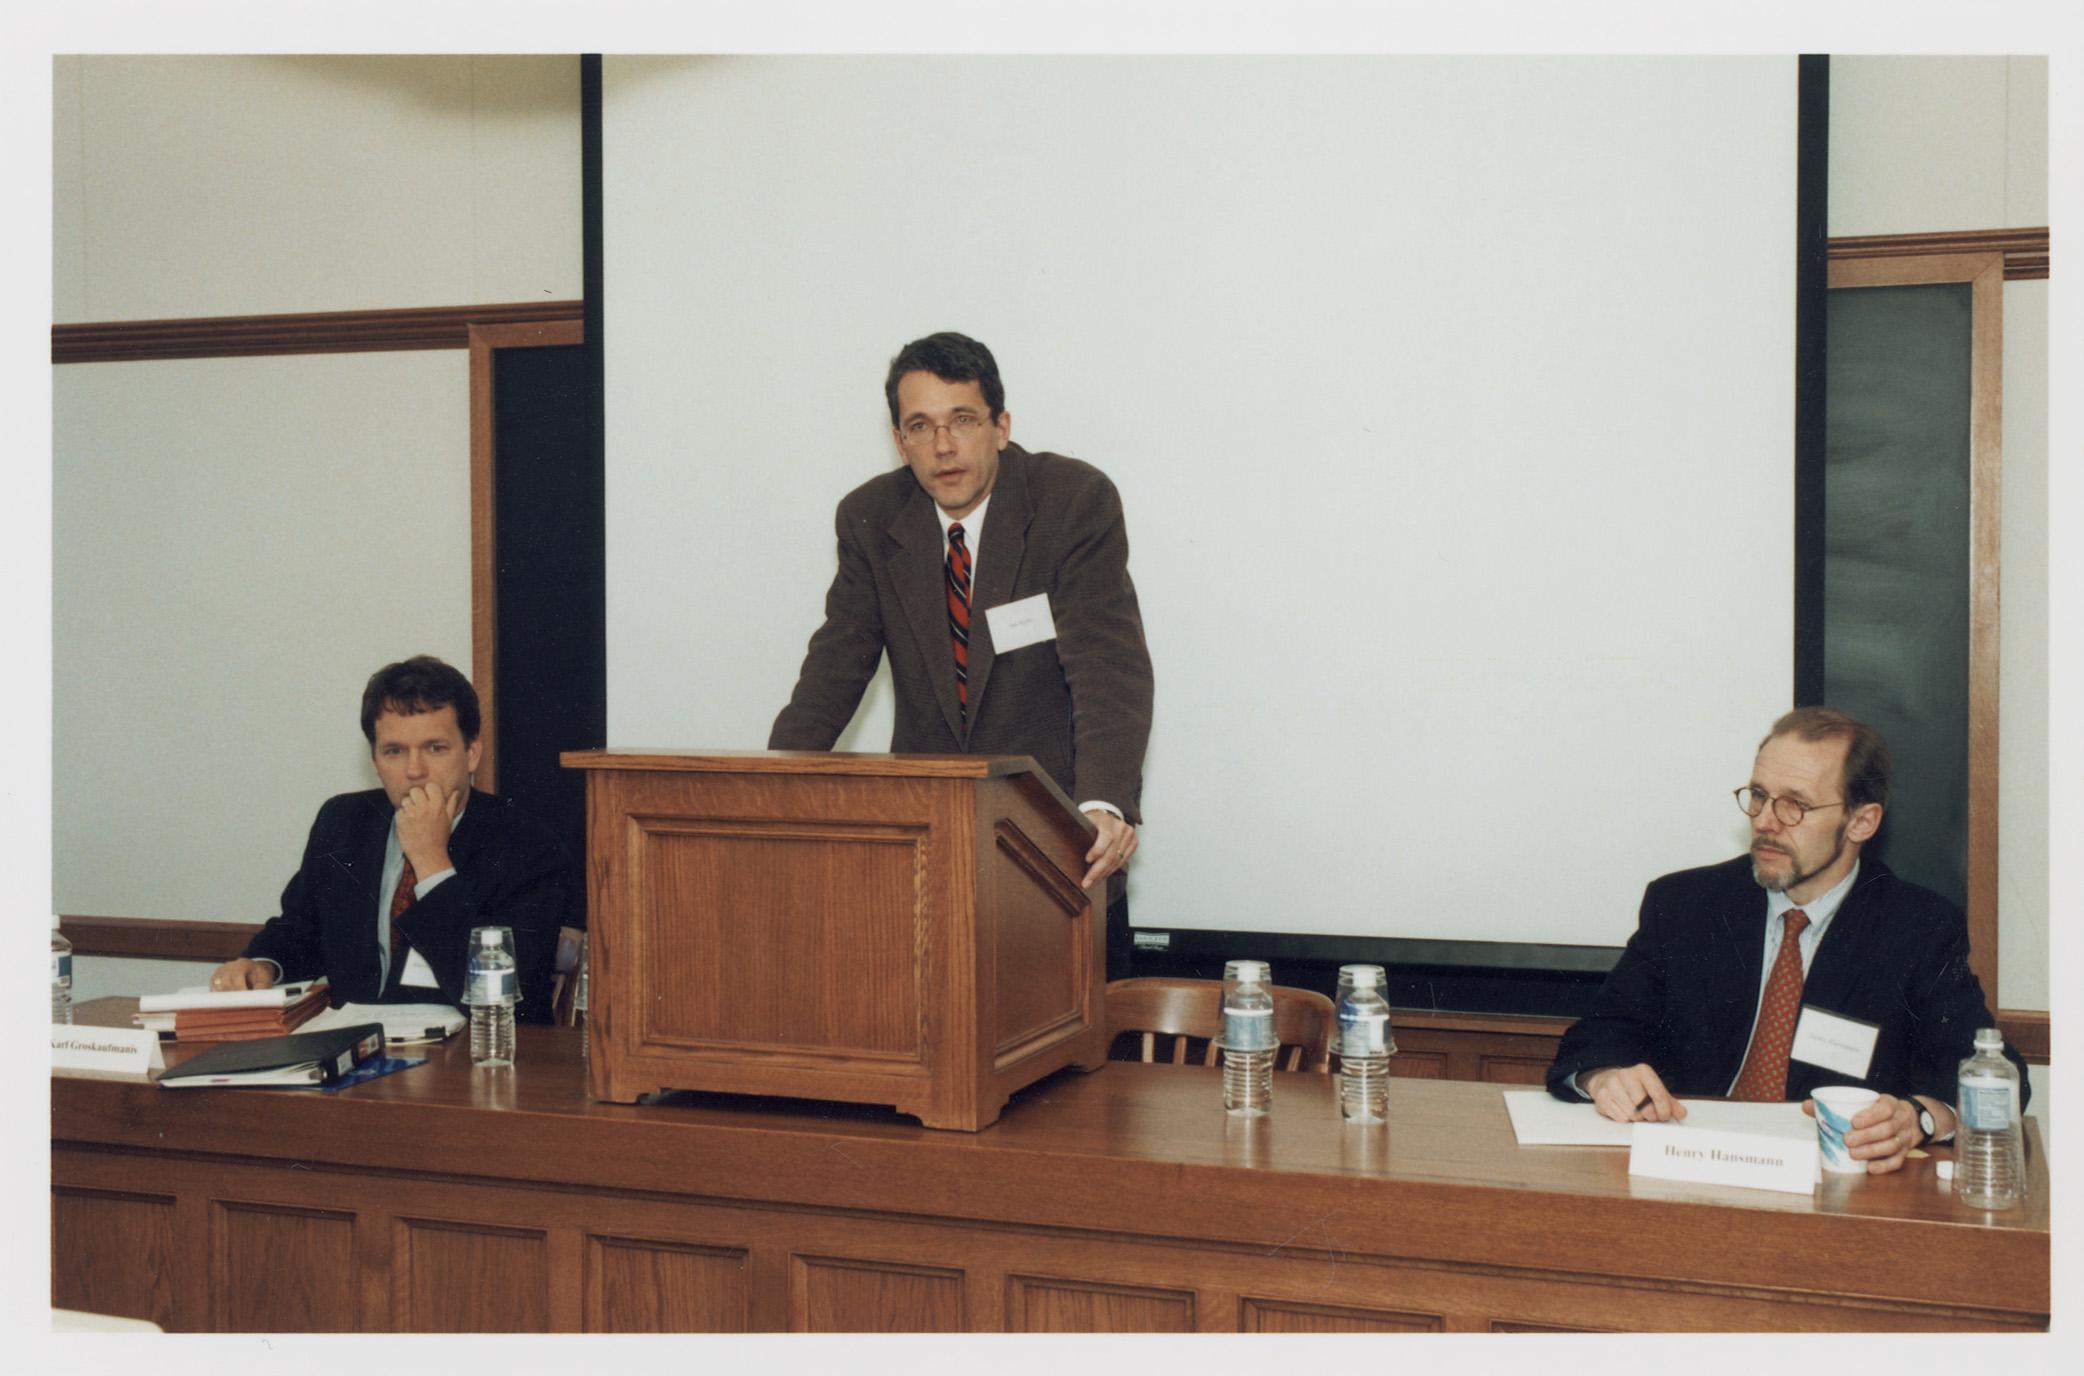 Karl Groskaufmanis and YLS Profs. Ian Ayres '86 and Henry Hansmann '74